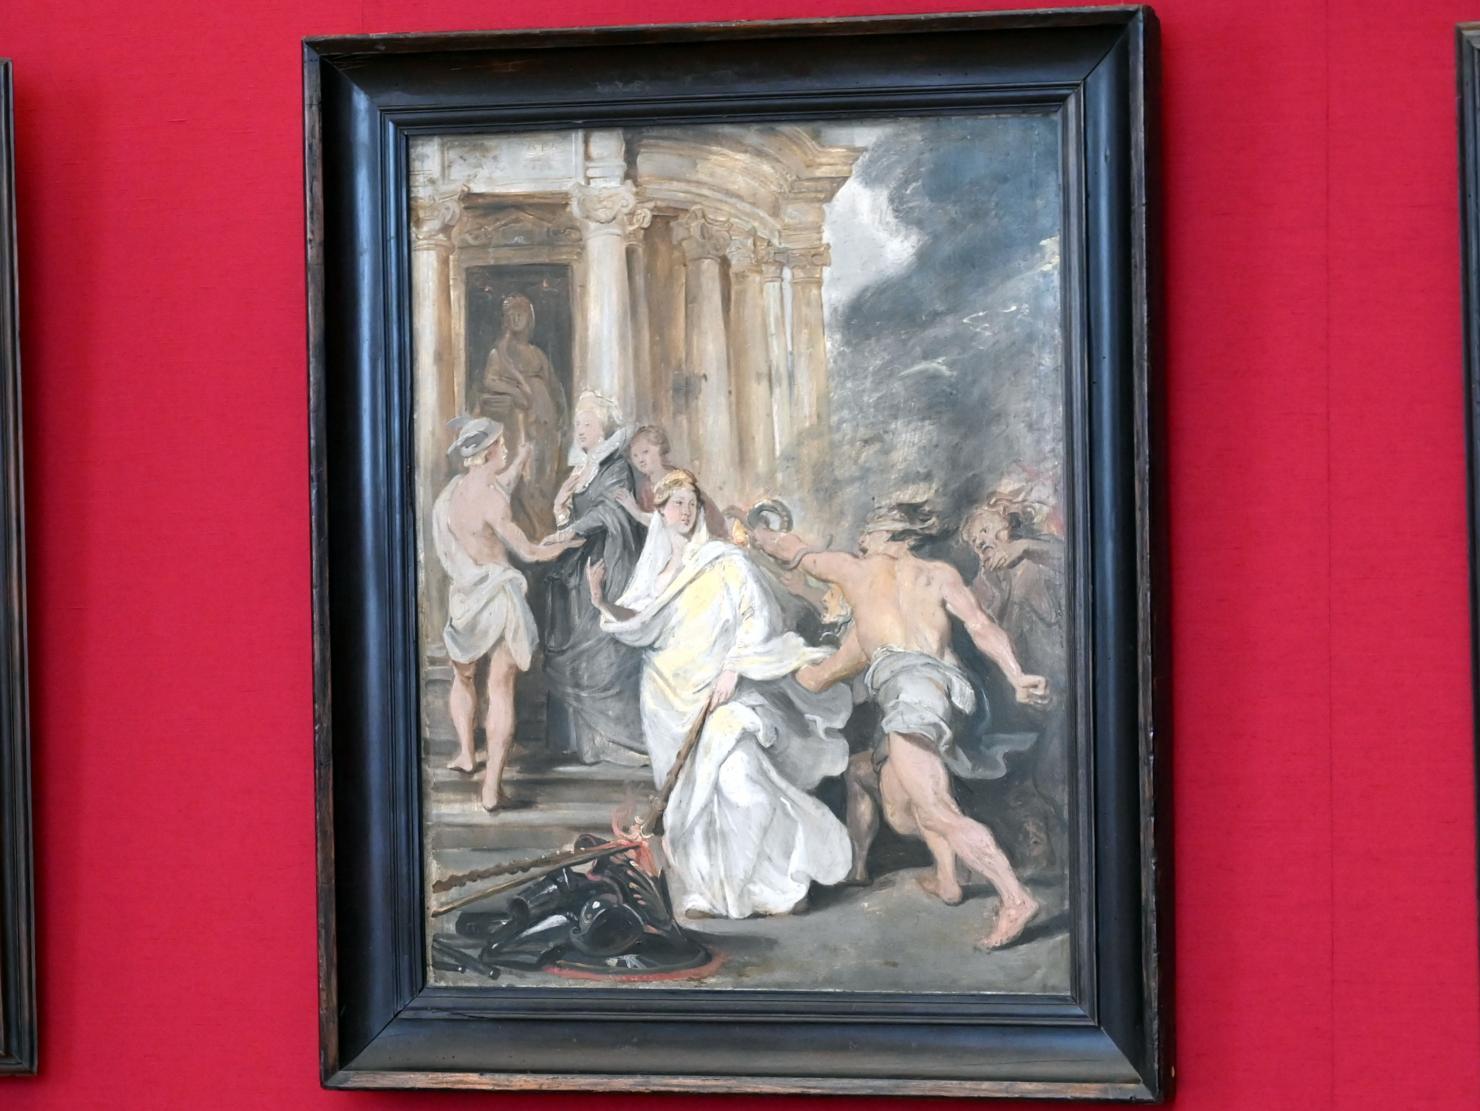 Peter Paul Rubens: Der Friedenschluss in Angers (Skizze zum Medici-Zyklus), 1622